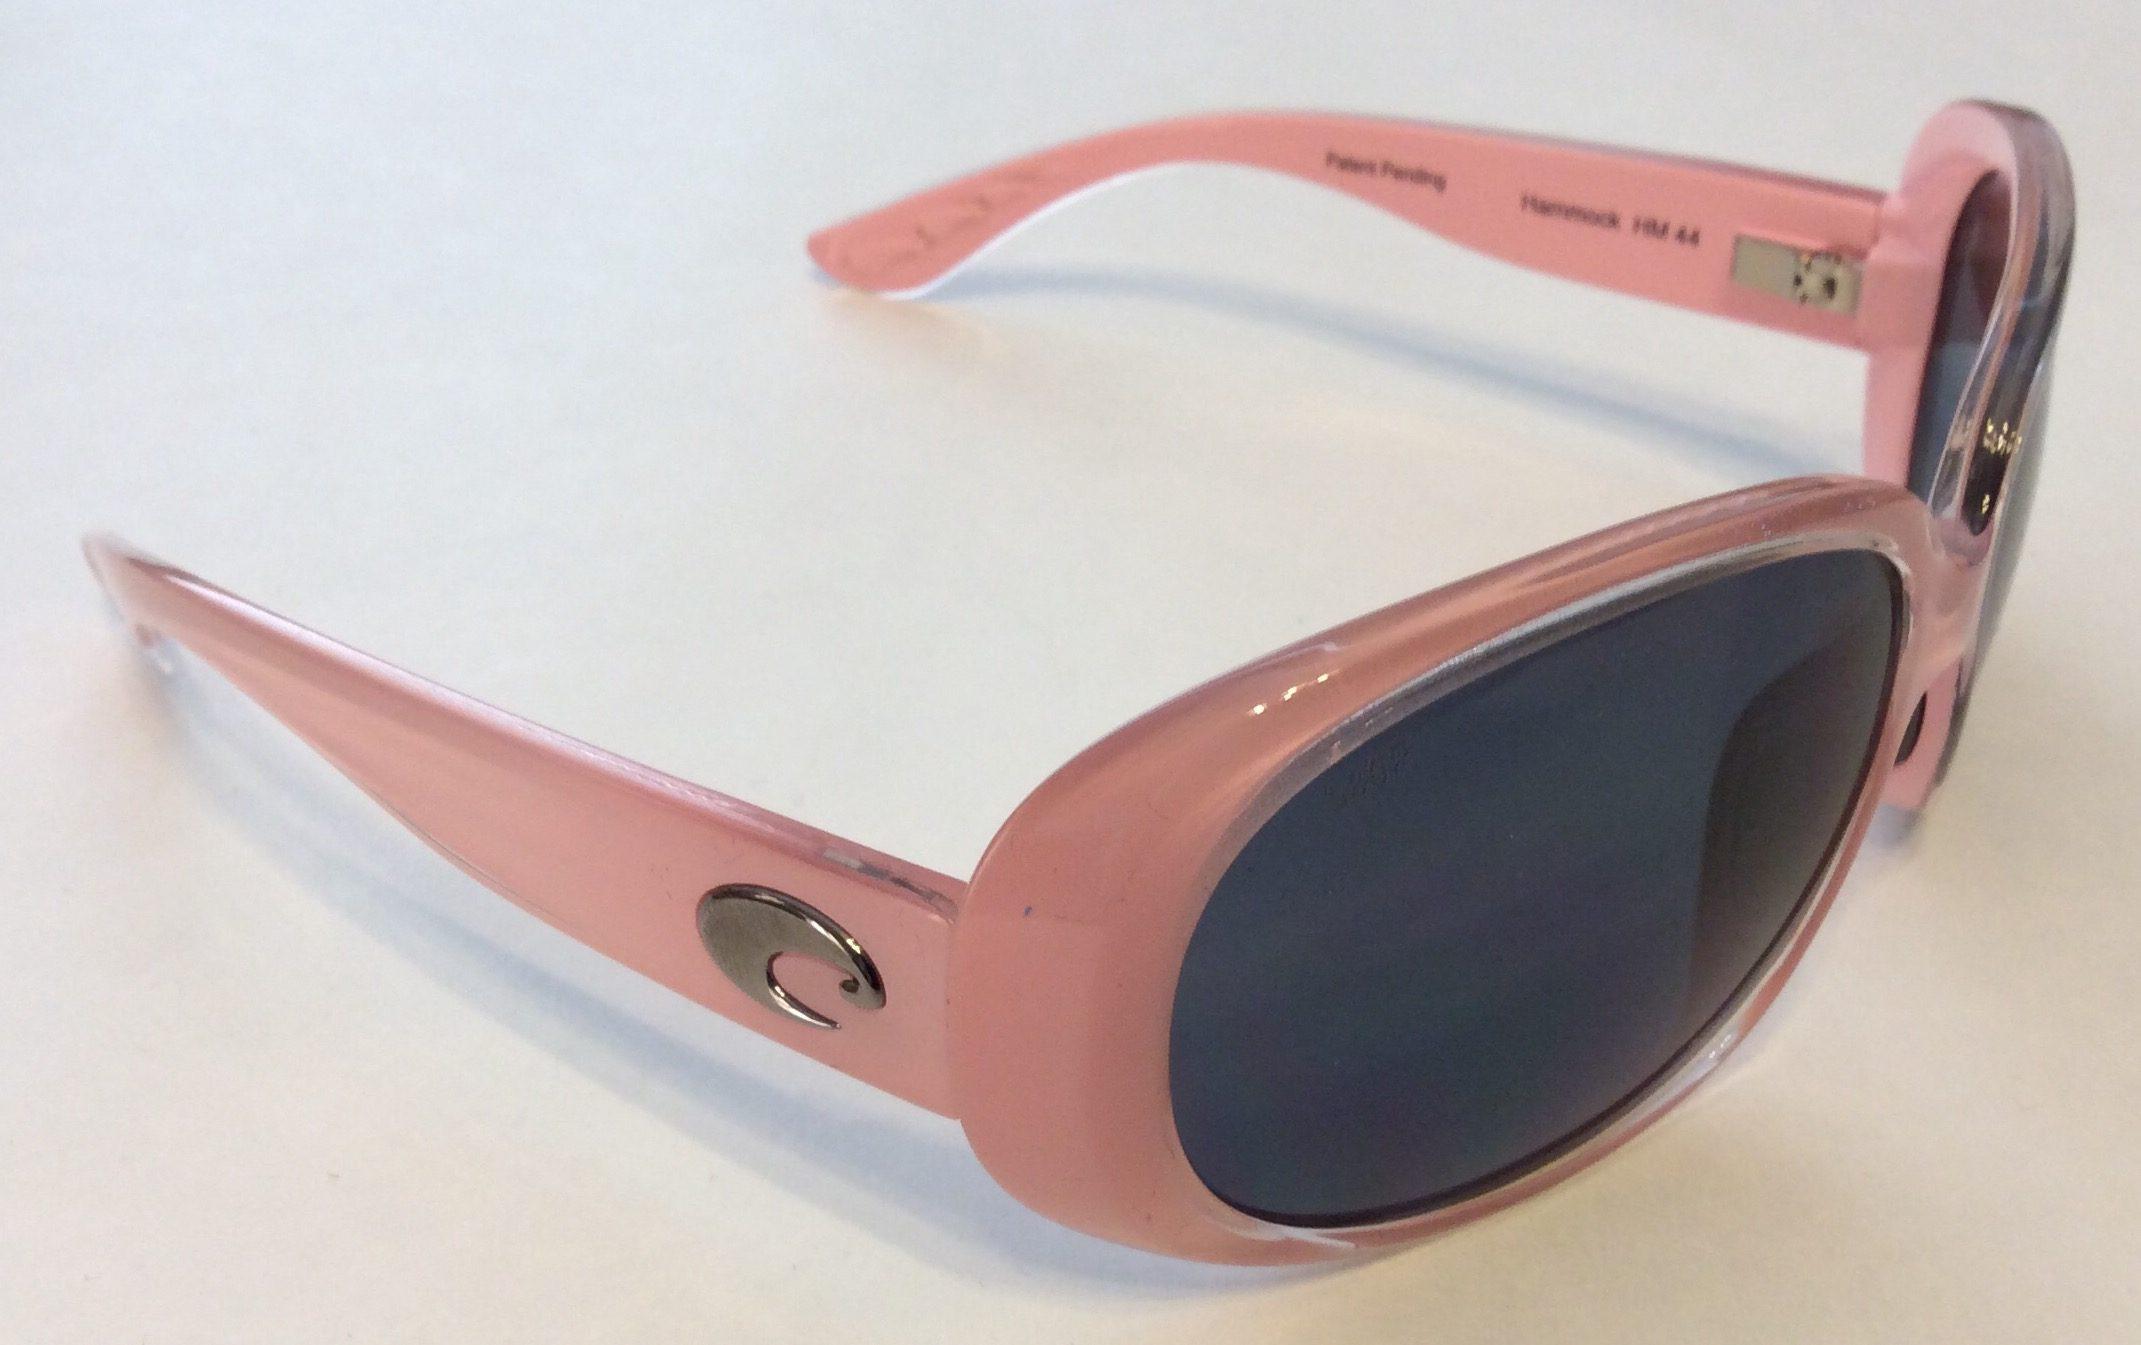 costa del mar hammock sunglasses   coral pink polarized gray 580p costa del mar hammock  u2013 coral pink polarized gray 580p      rh   nativeslope